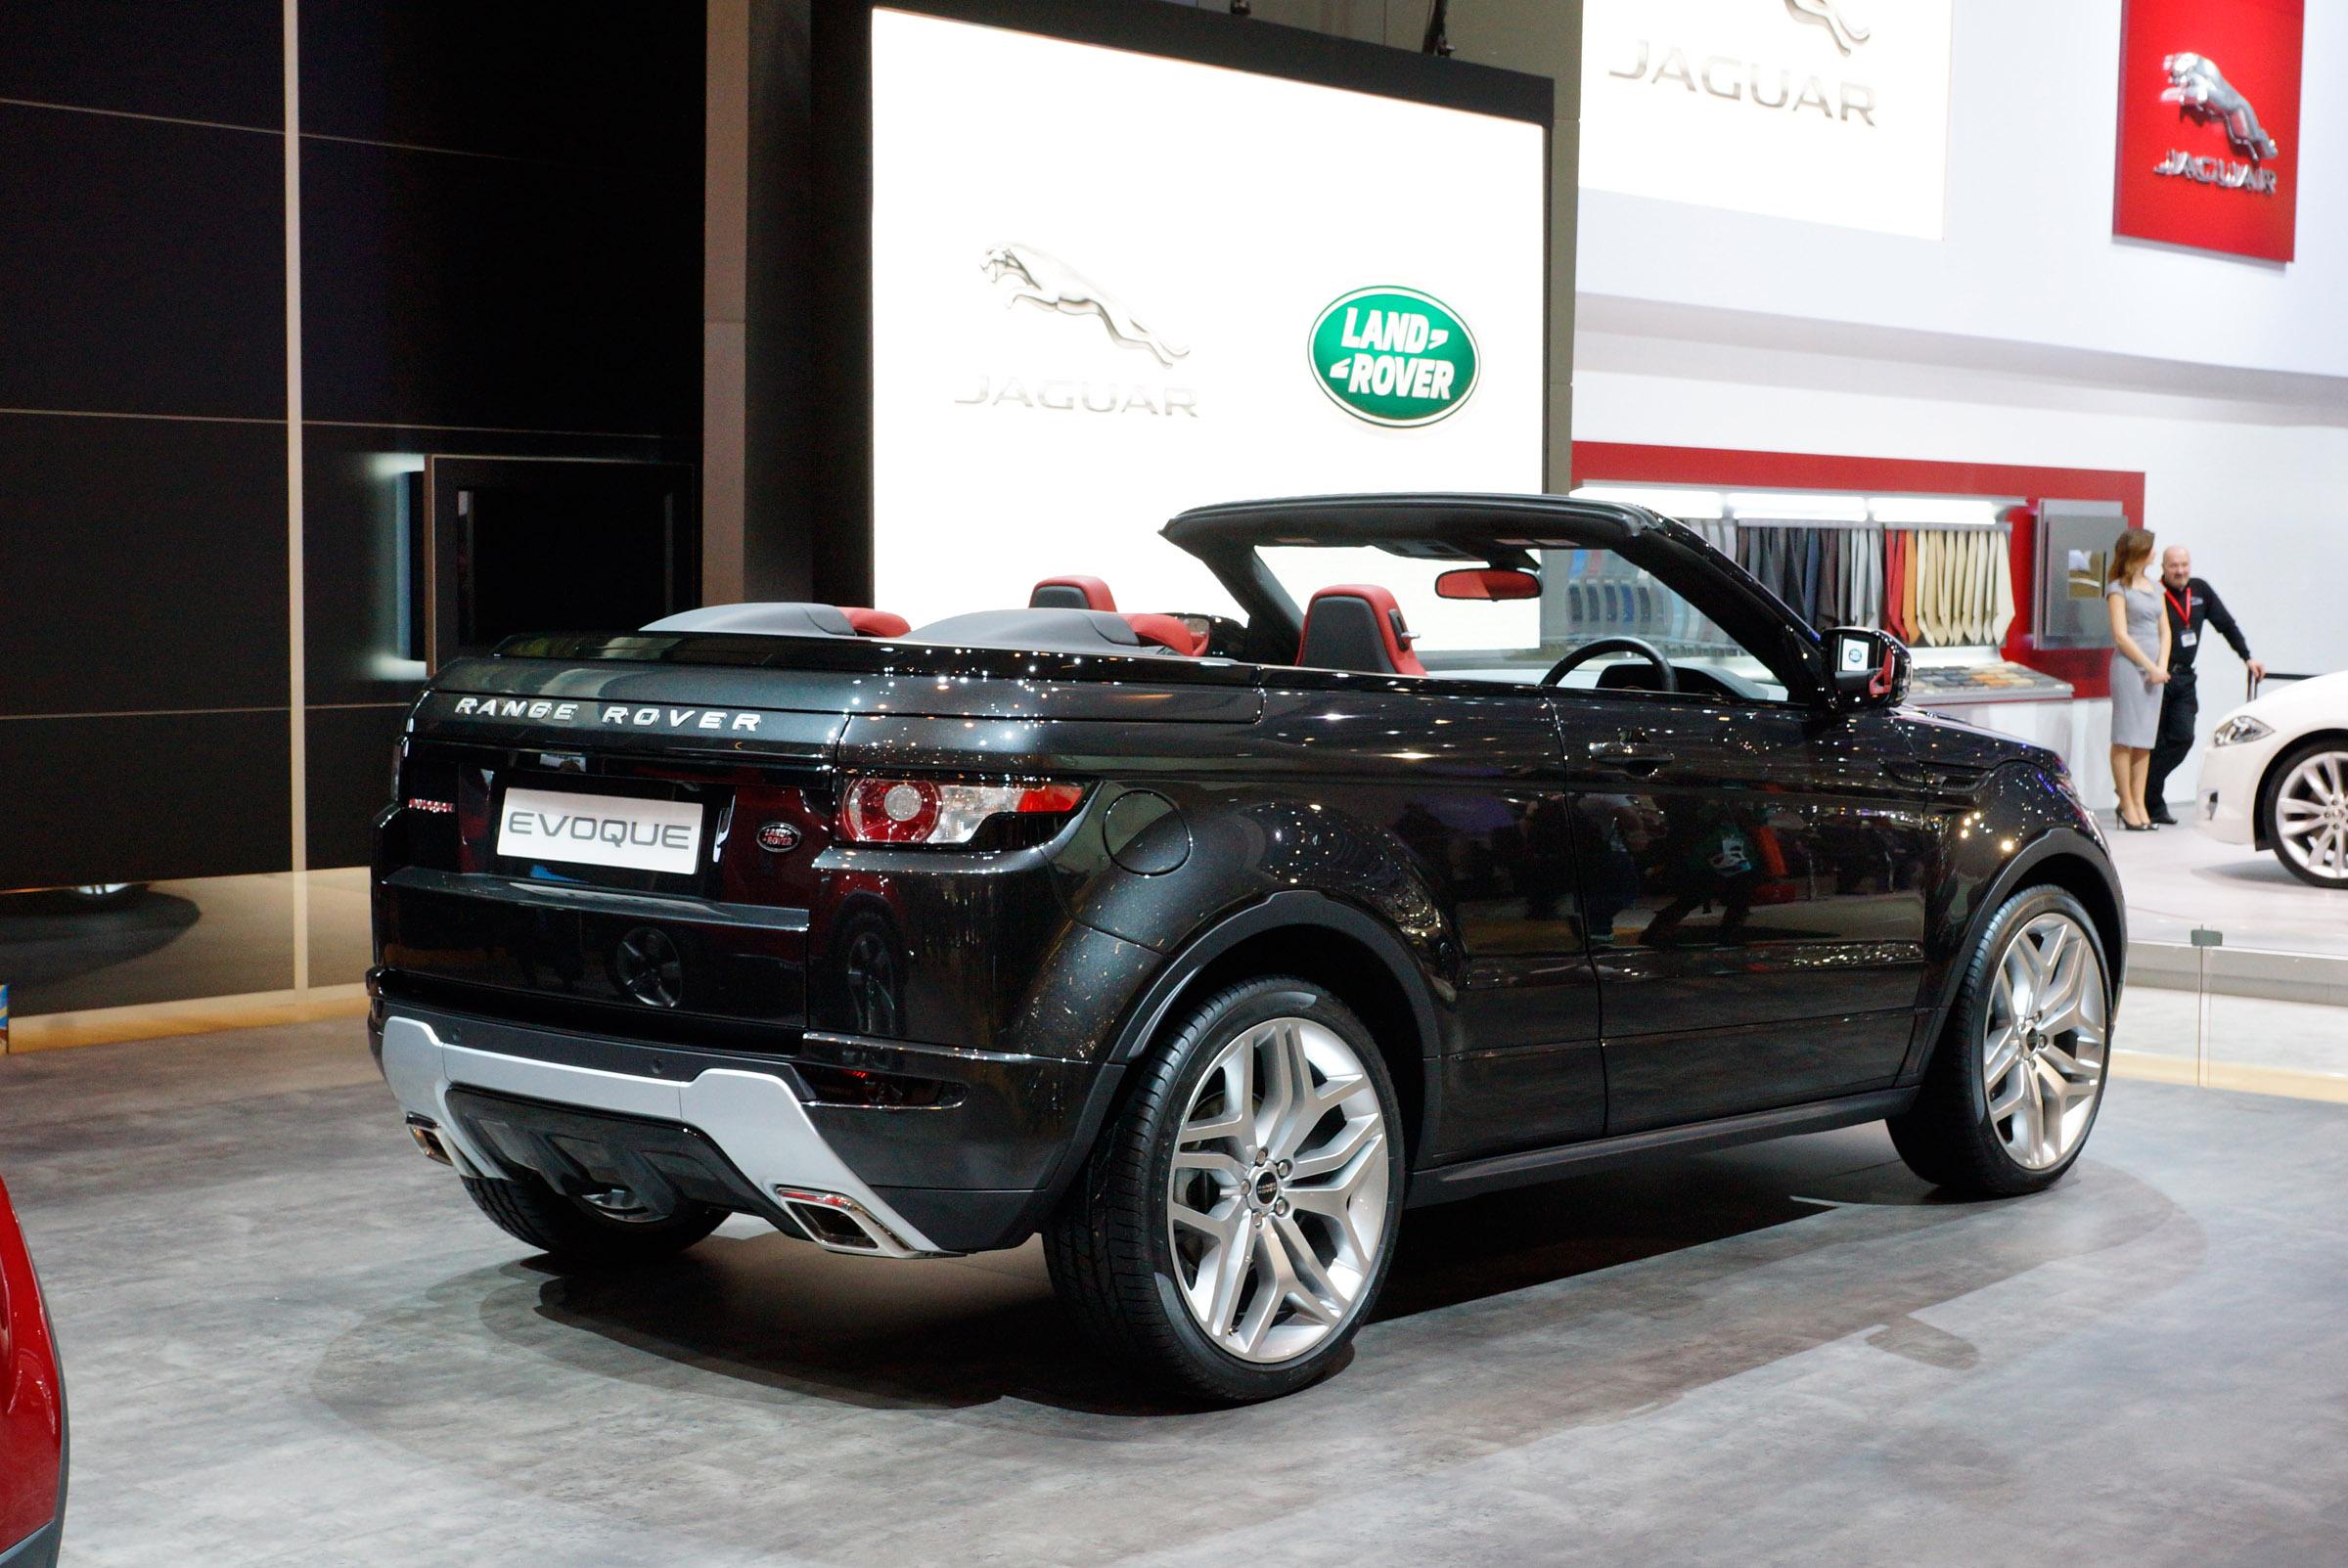 2012 geneva motor show range rover evoque convertible. Black Bedroom Furniture Sets. Home Design Ideas